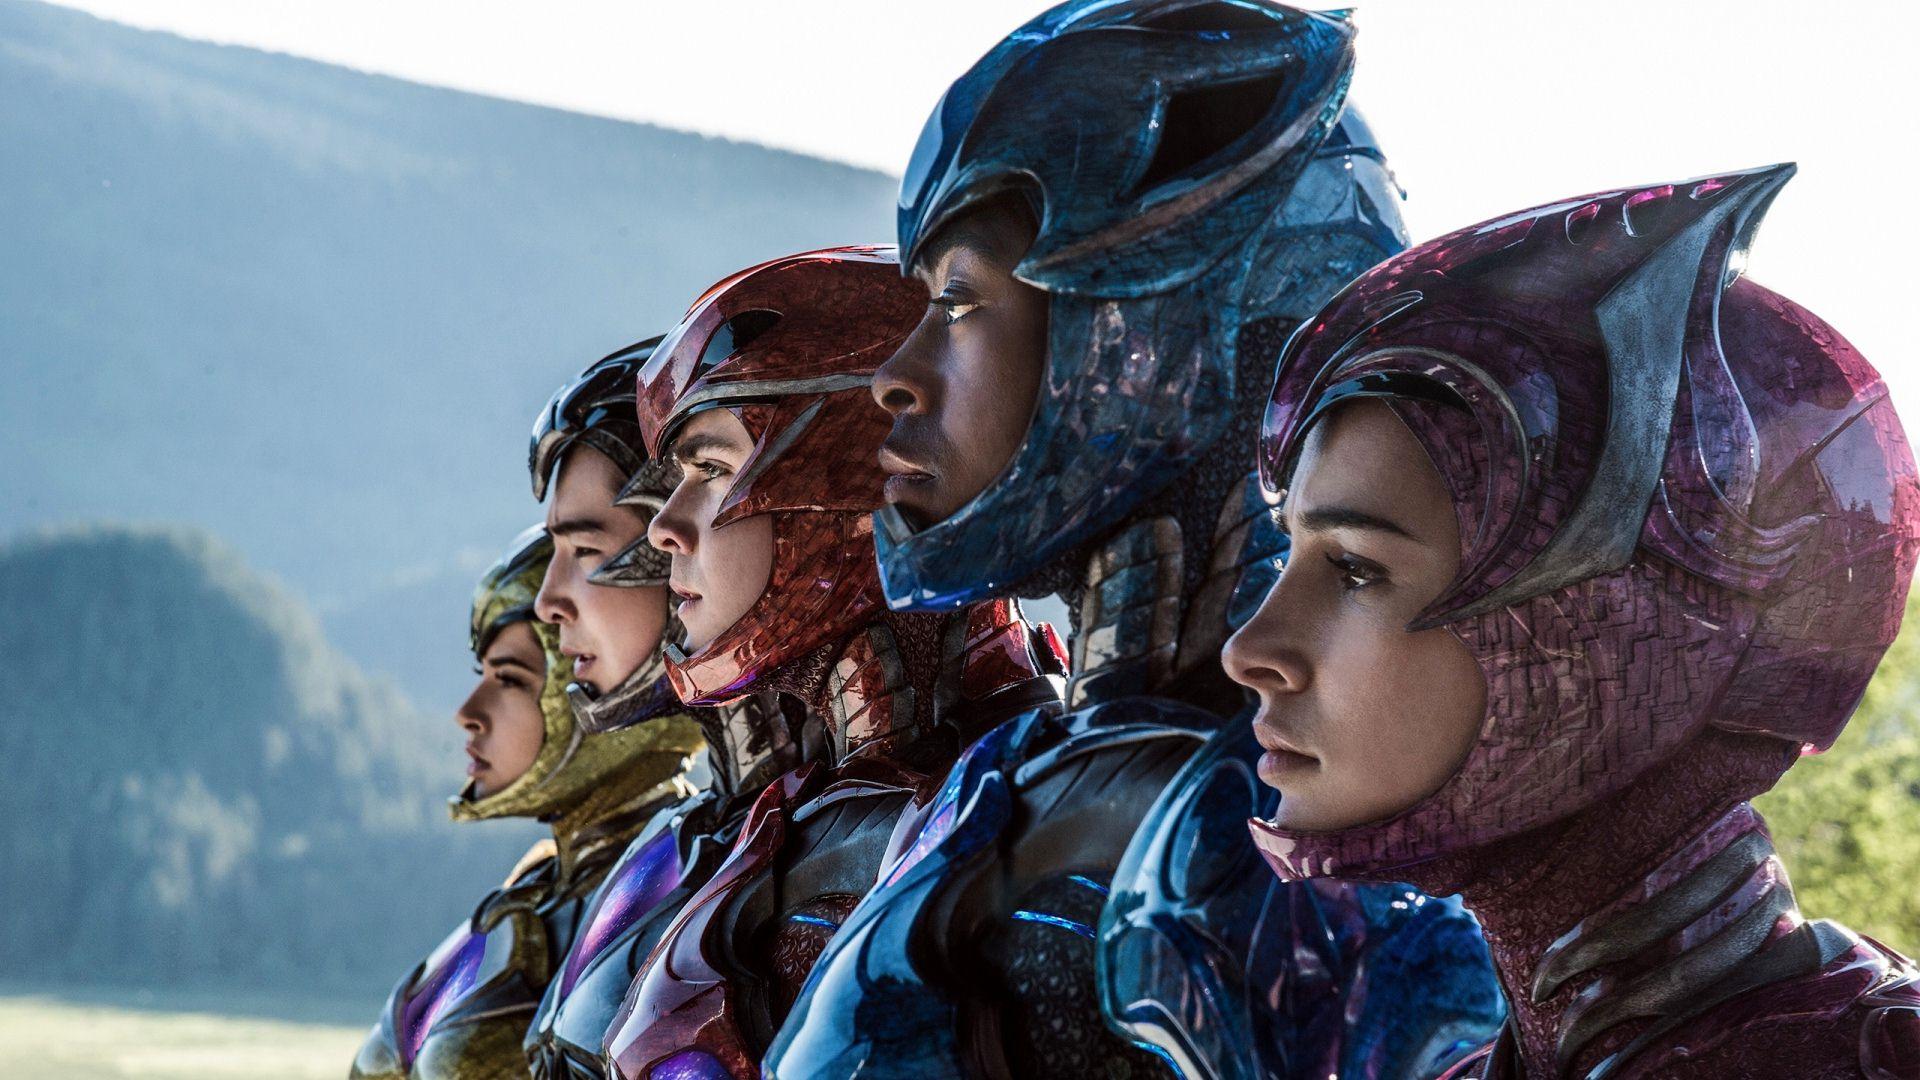 Superheroes-Power-Rangers-2017-Characters-Wallpaper-10496